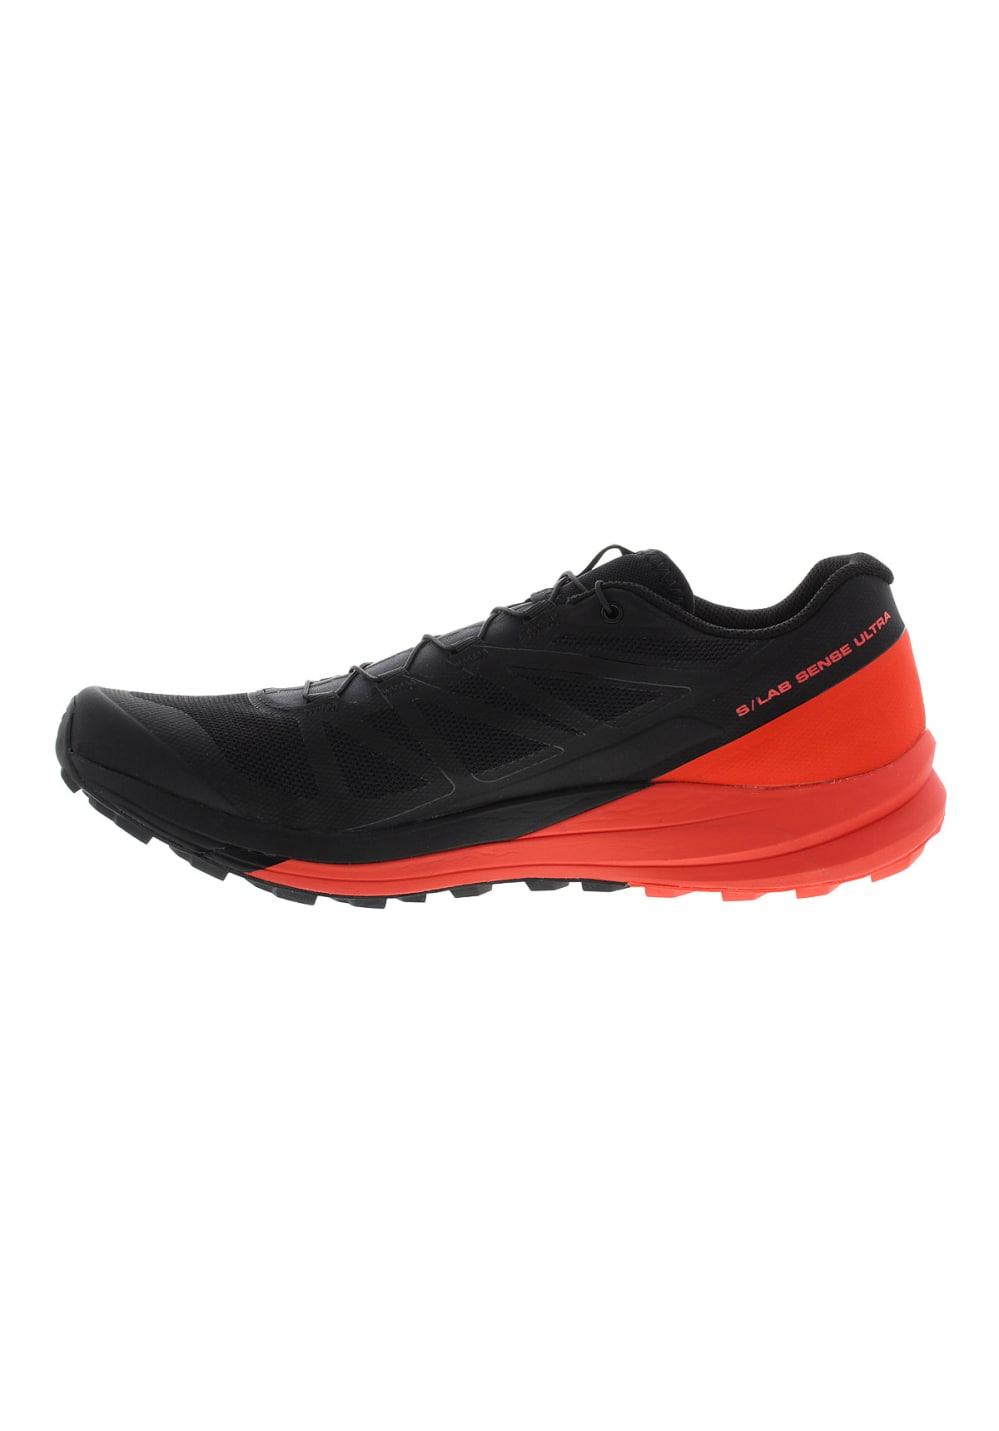 outlet store 26e2d 2b5f2 Salomon S-Lab Sense Ultra - Running shoes - White